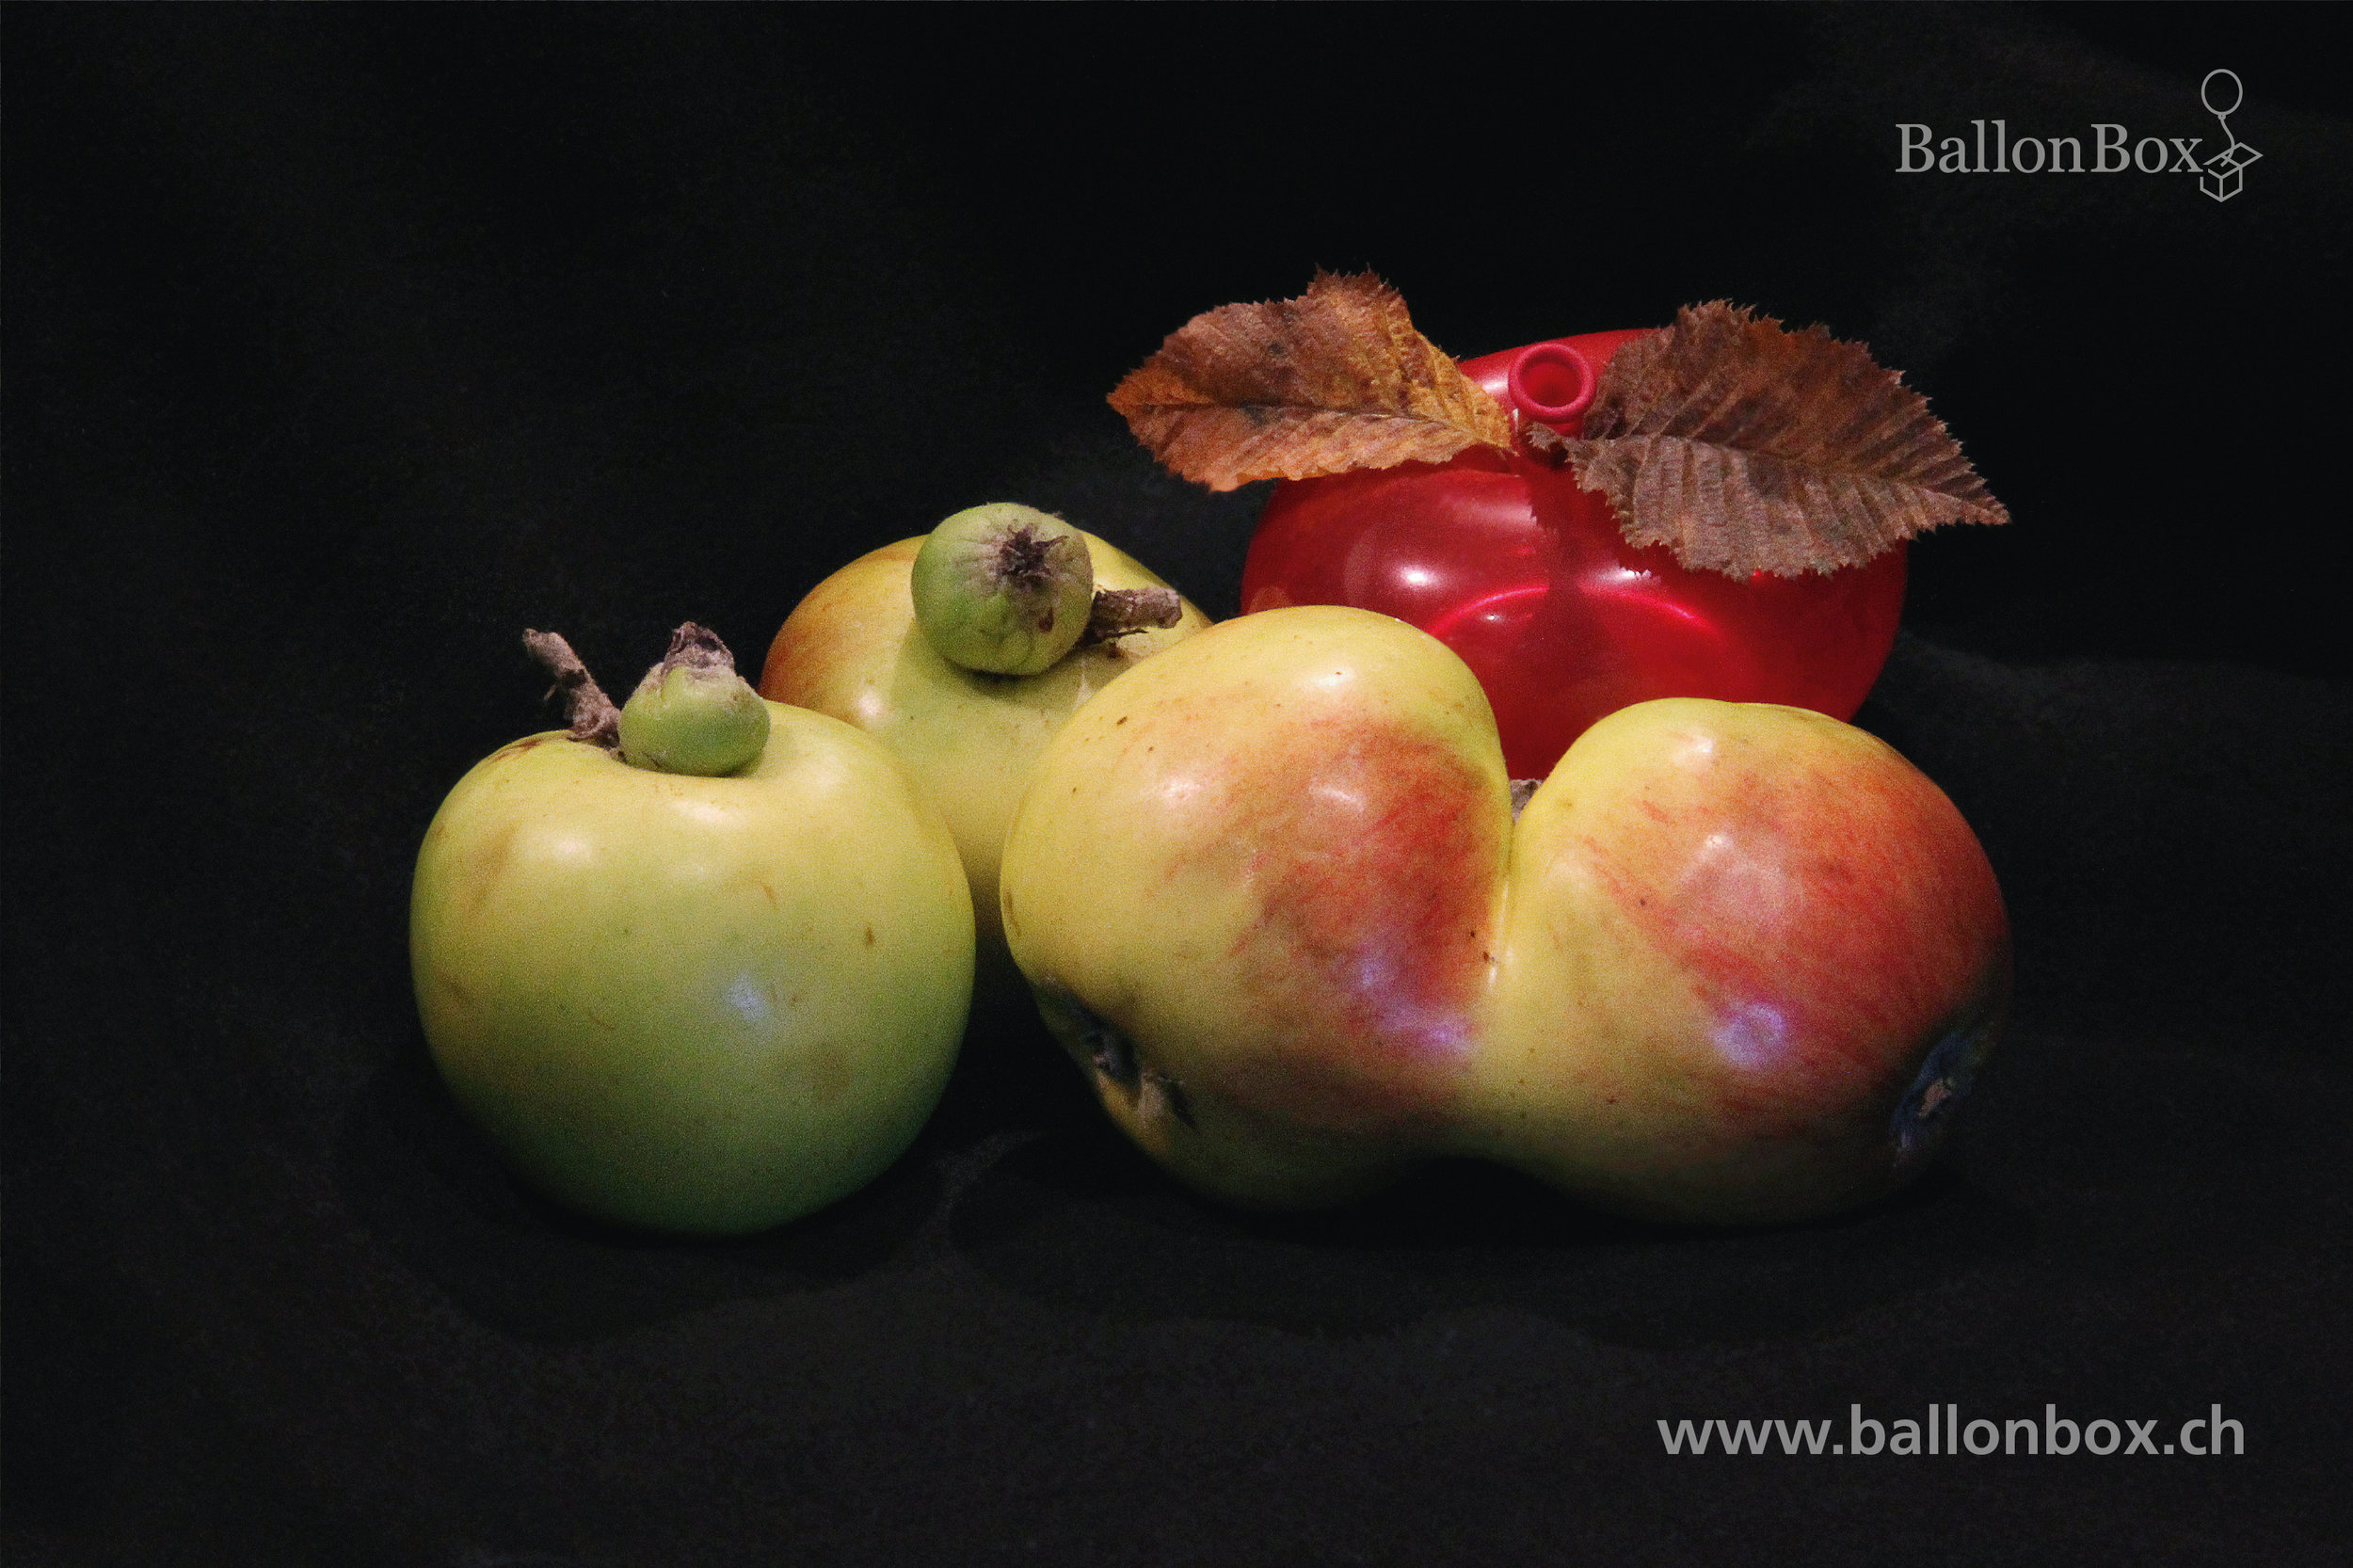 BallonBox_Kalender_18_09.jpg